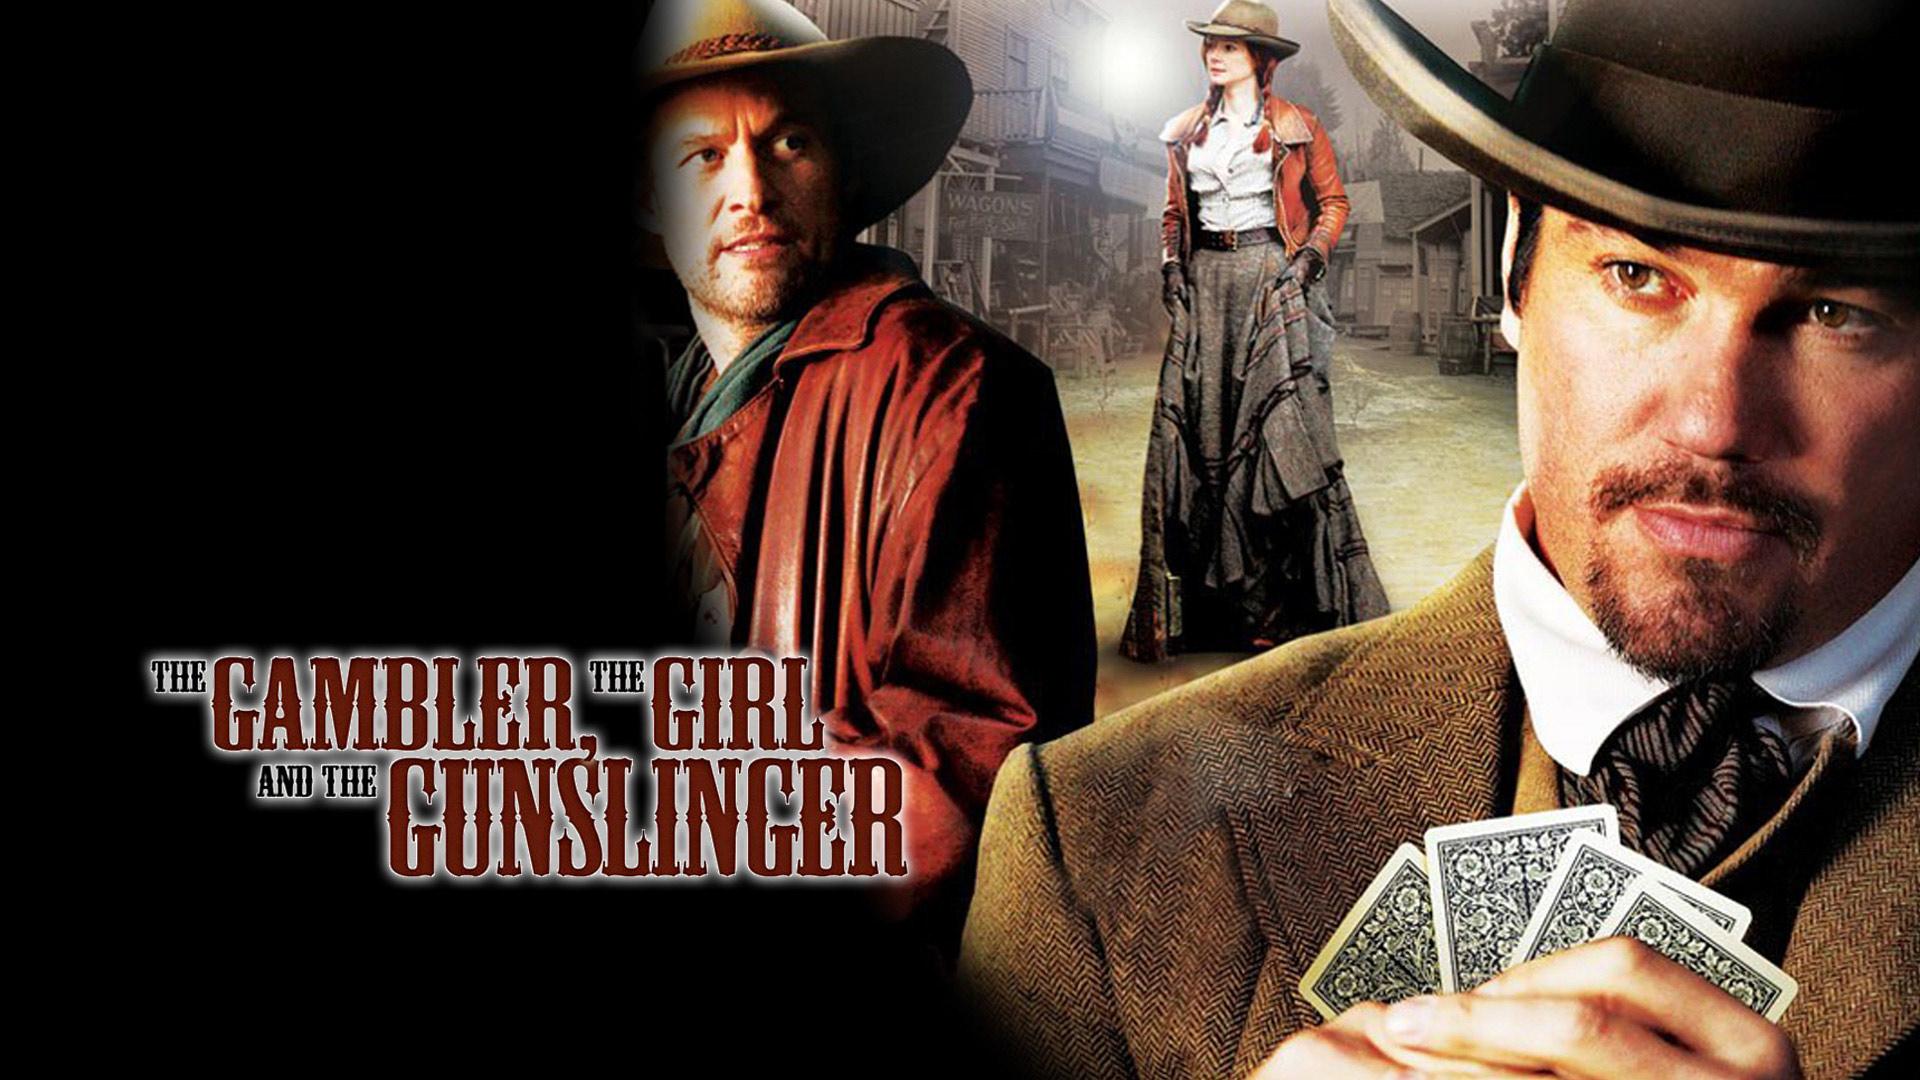 The Gambler, The Girl, And The Gunslinger